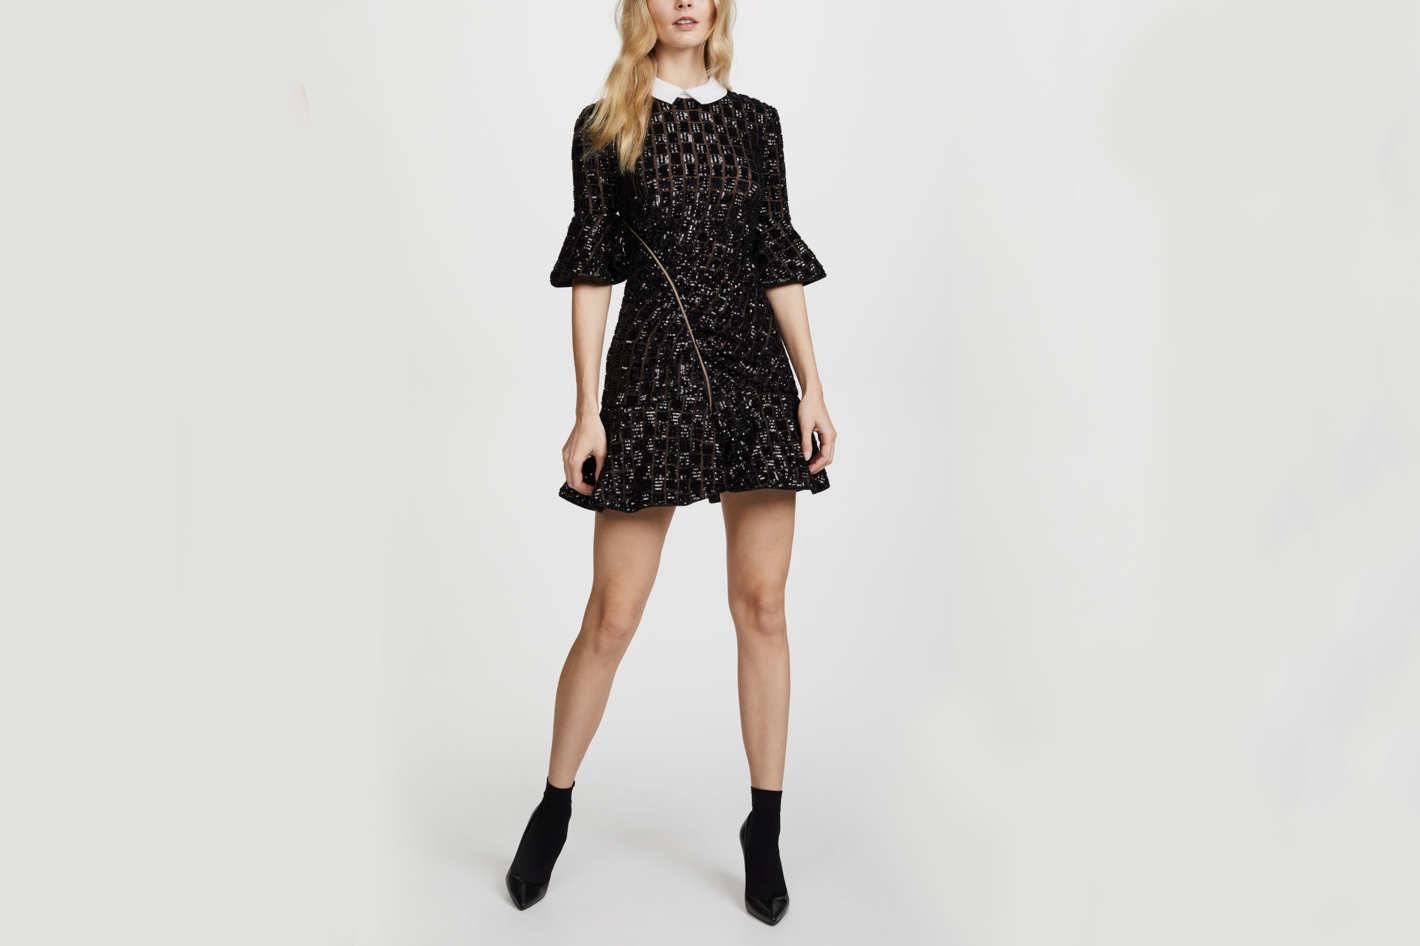 f70d879335fe Self-Portrait Sequin Embroidery Dress